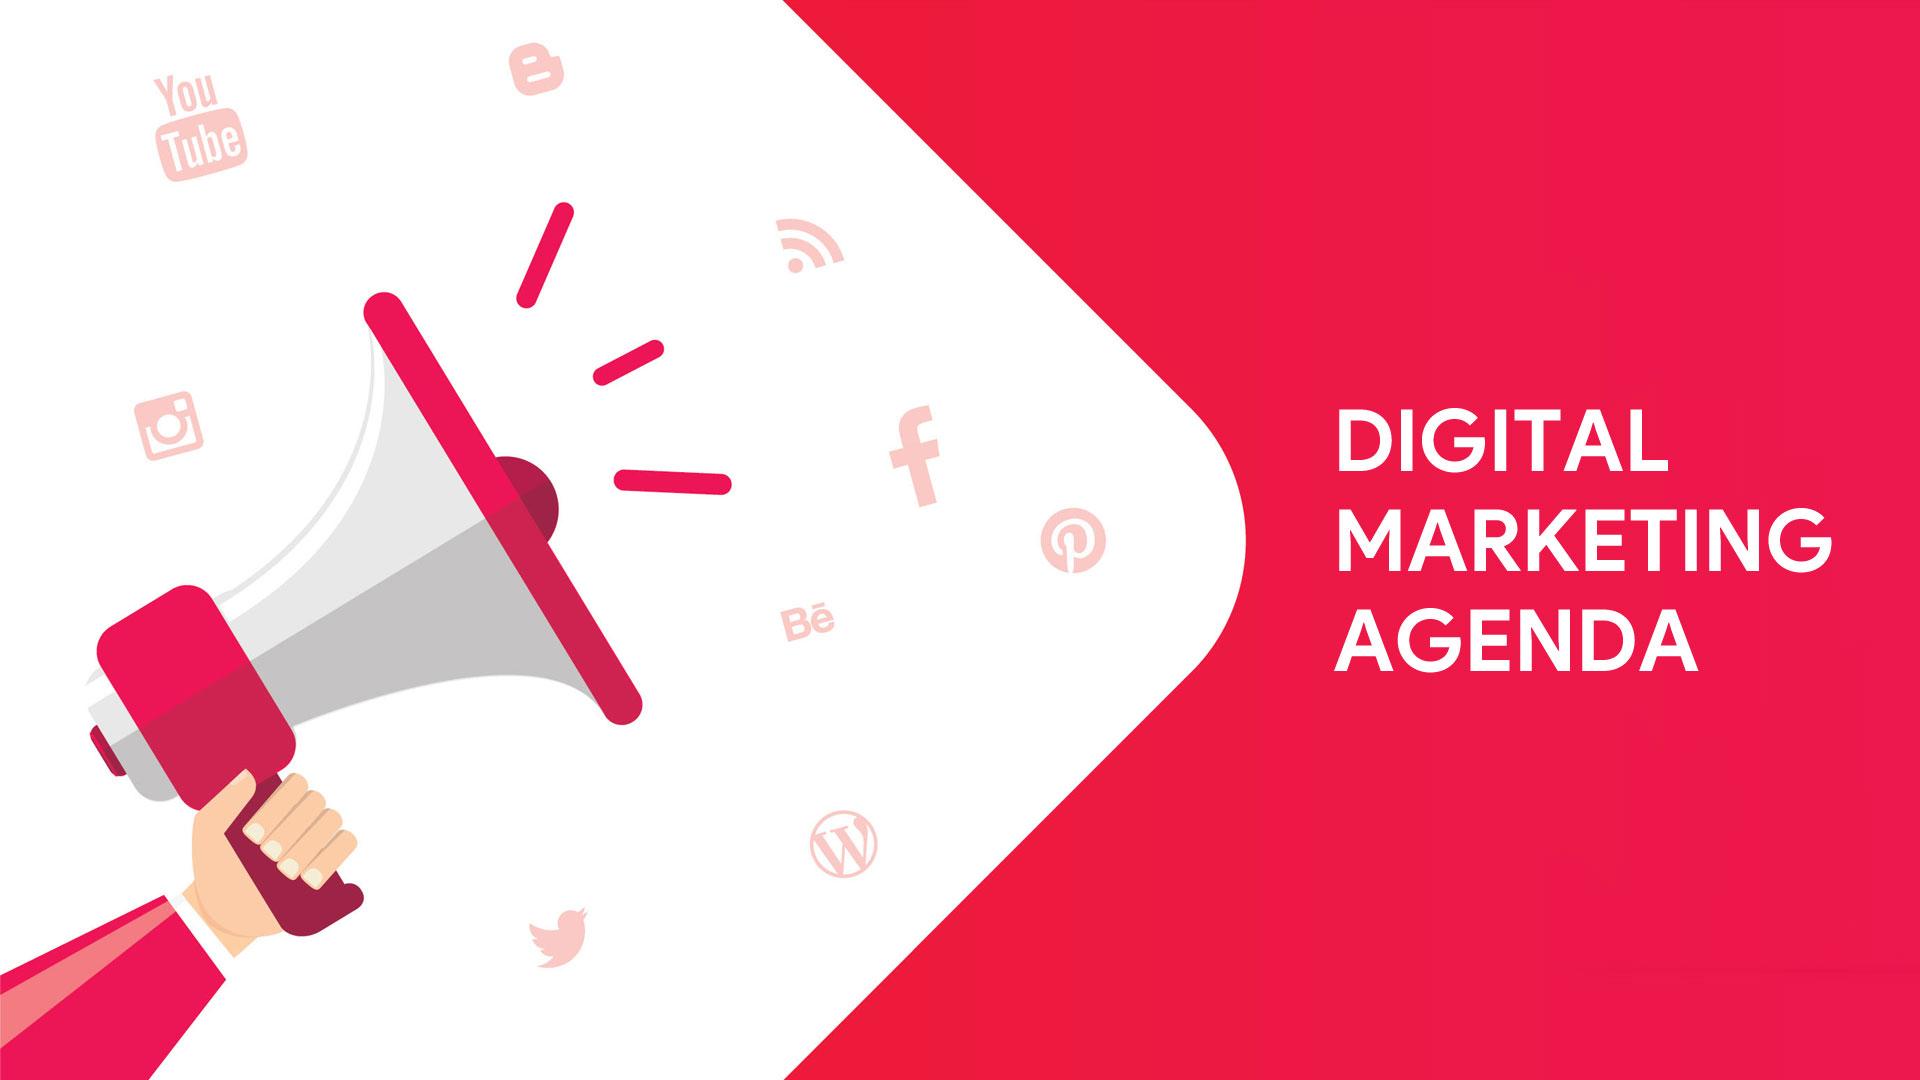 Digital Marketing Agenda